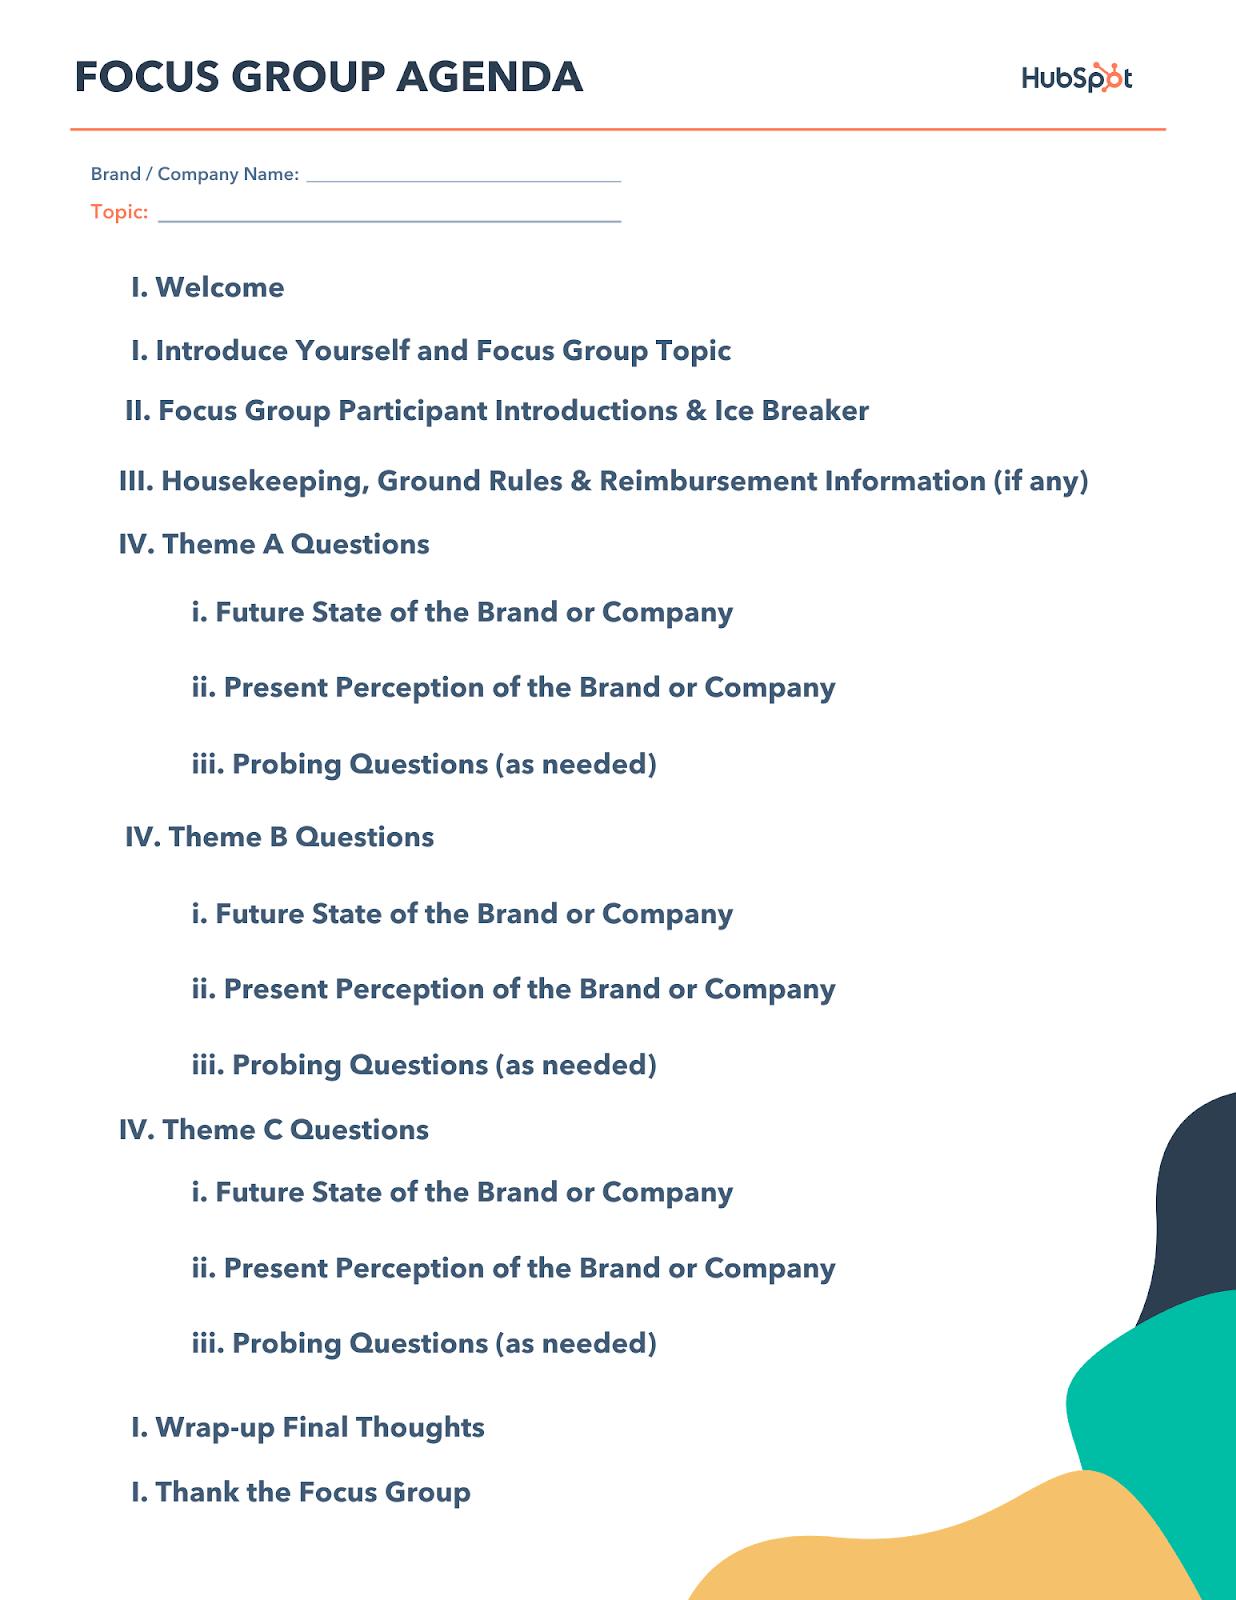 Focus Group Agenda template